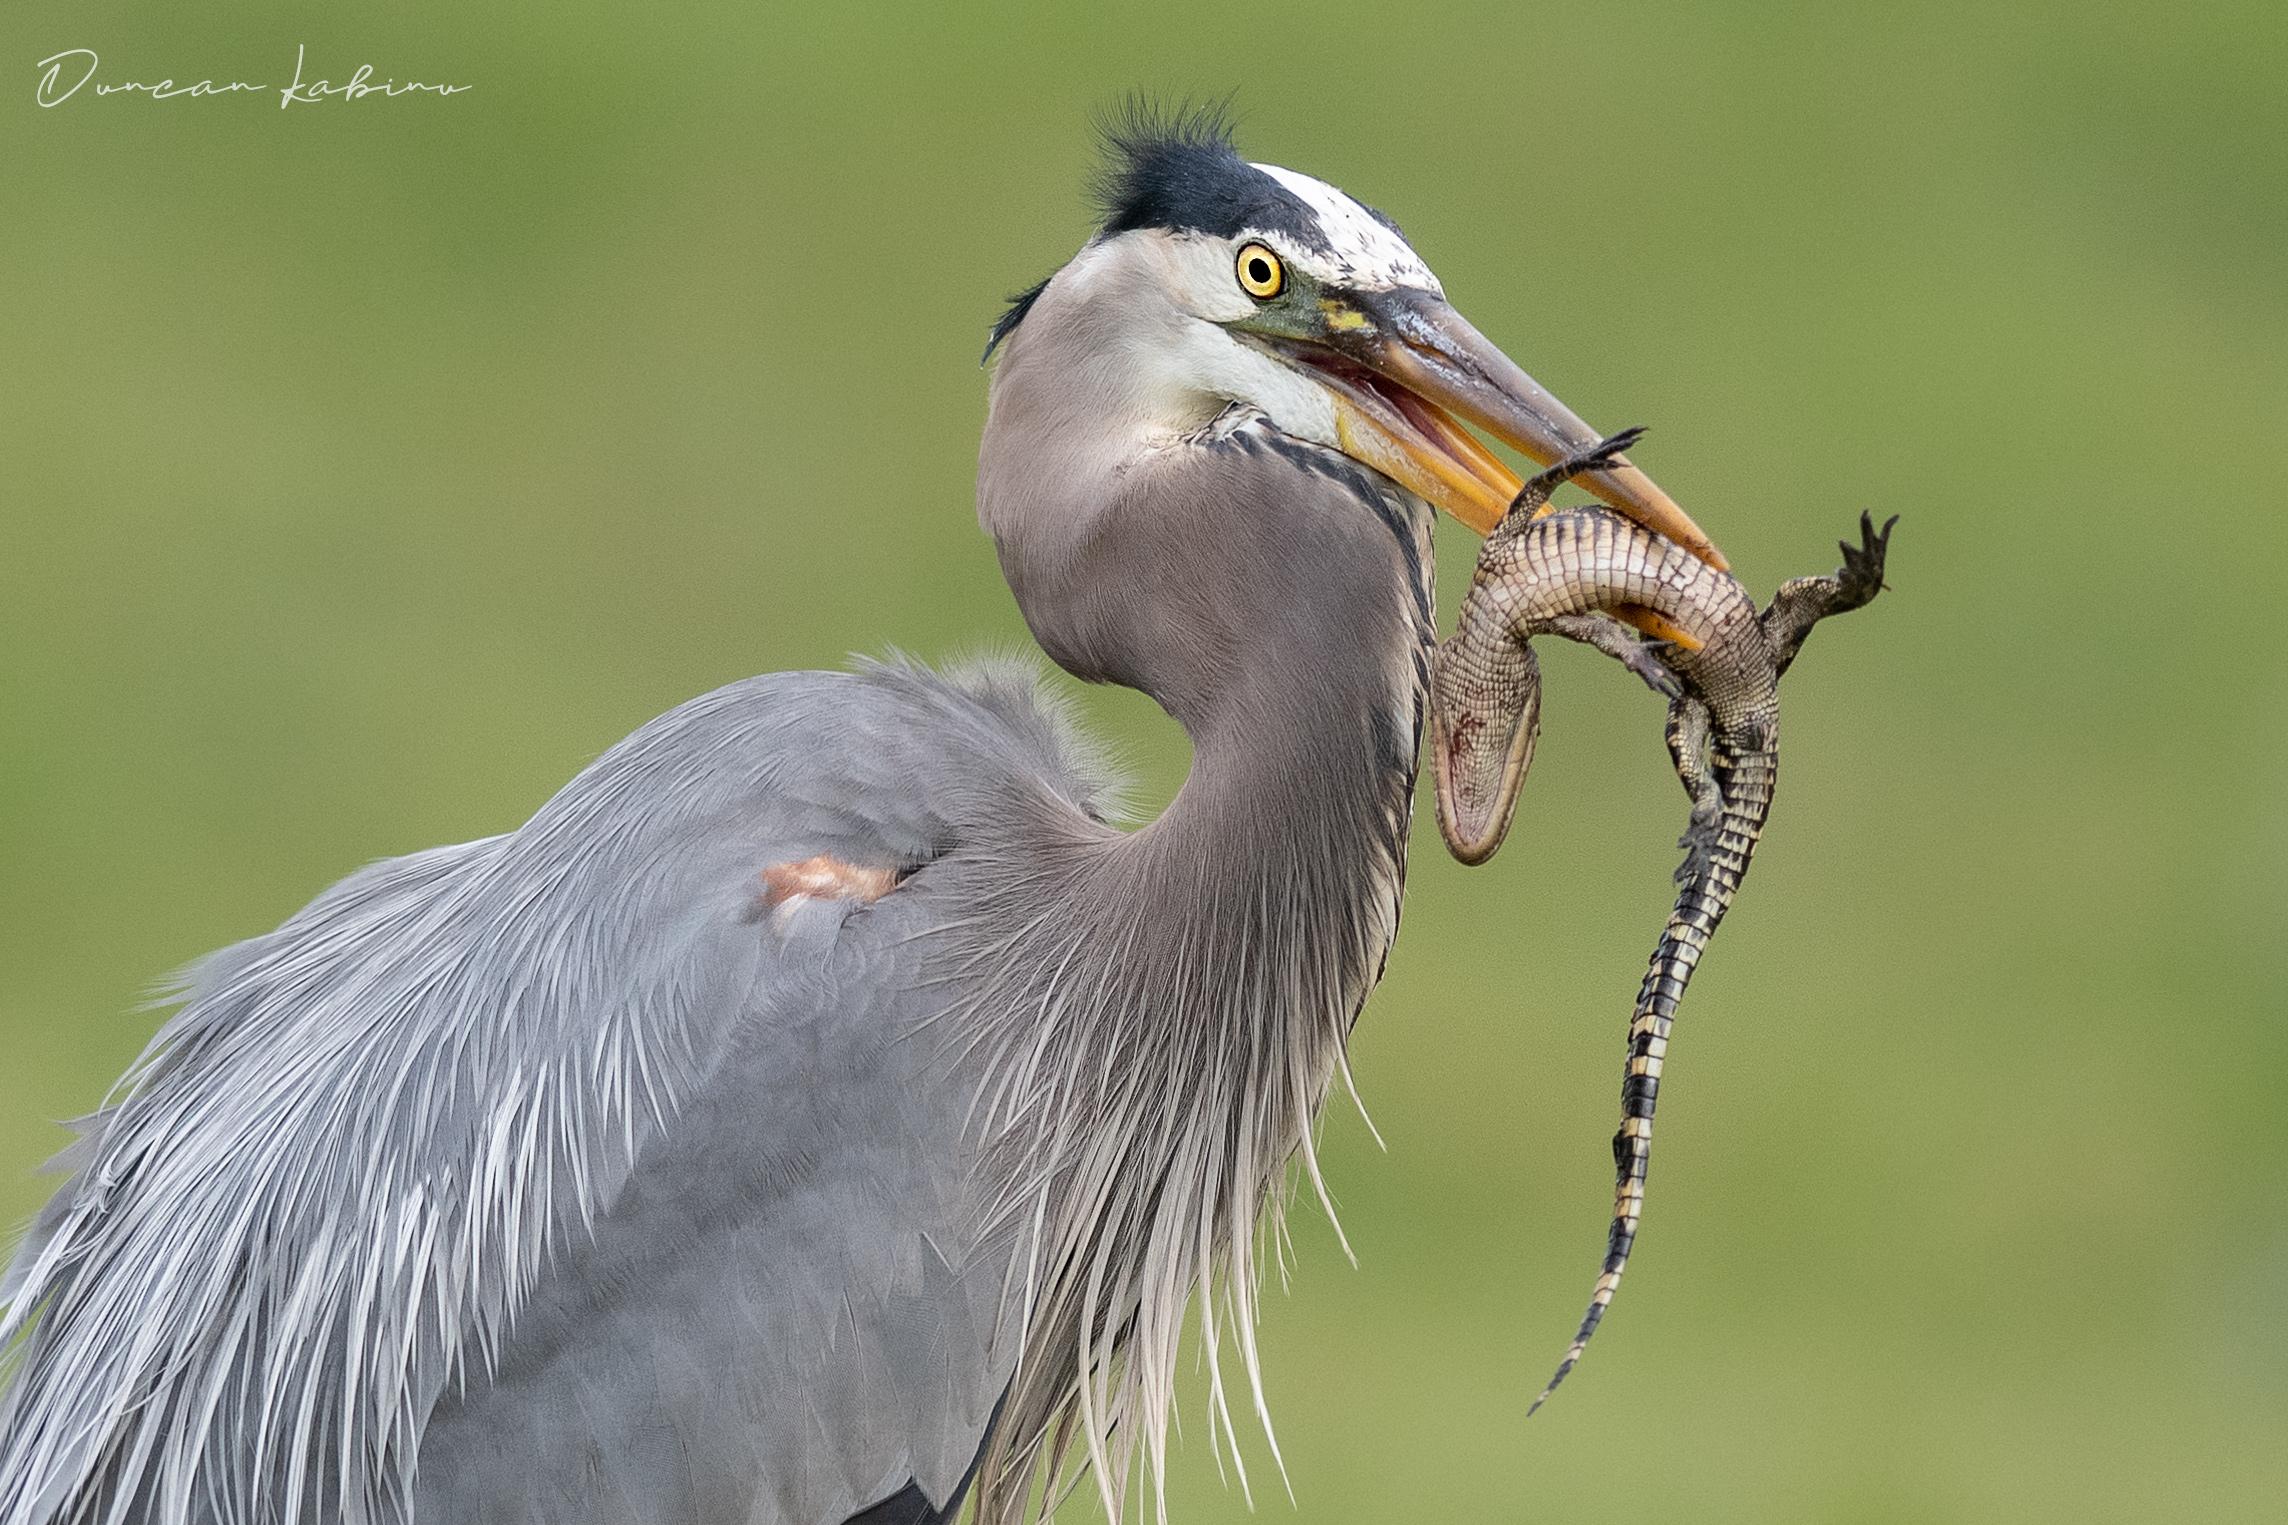 Heron eating a baby alligator